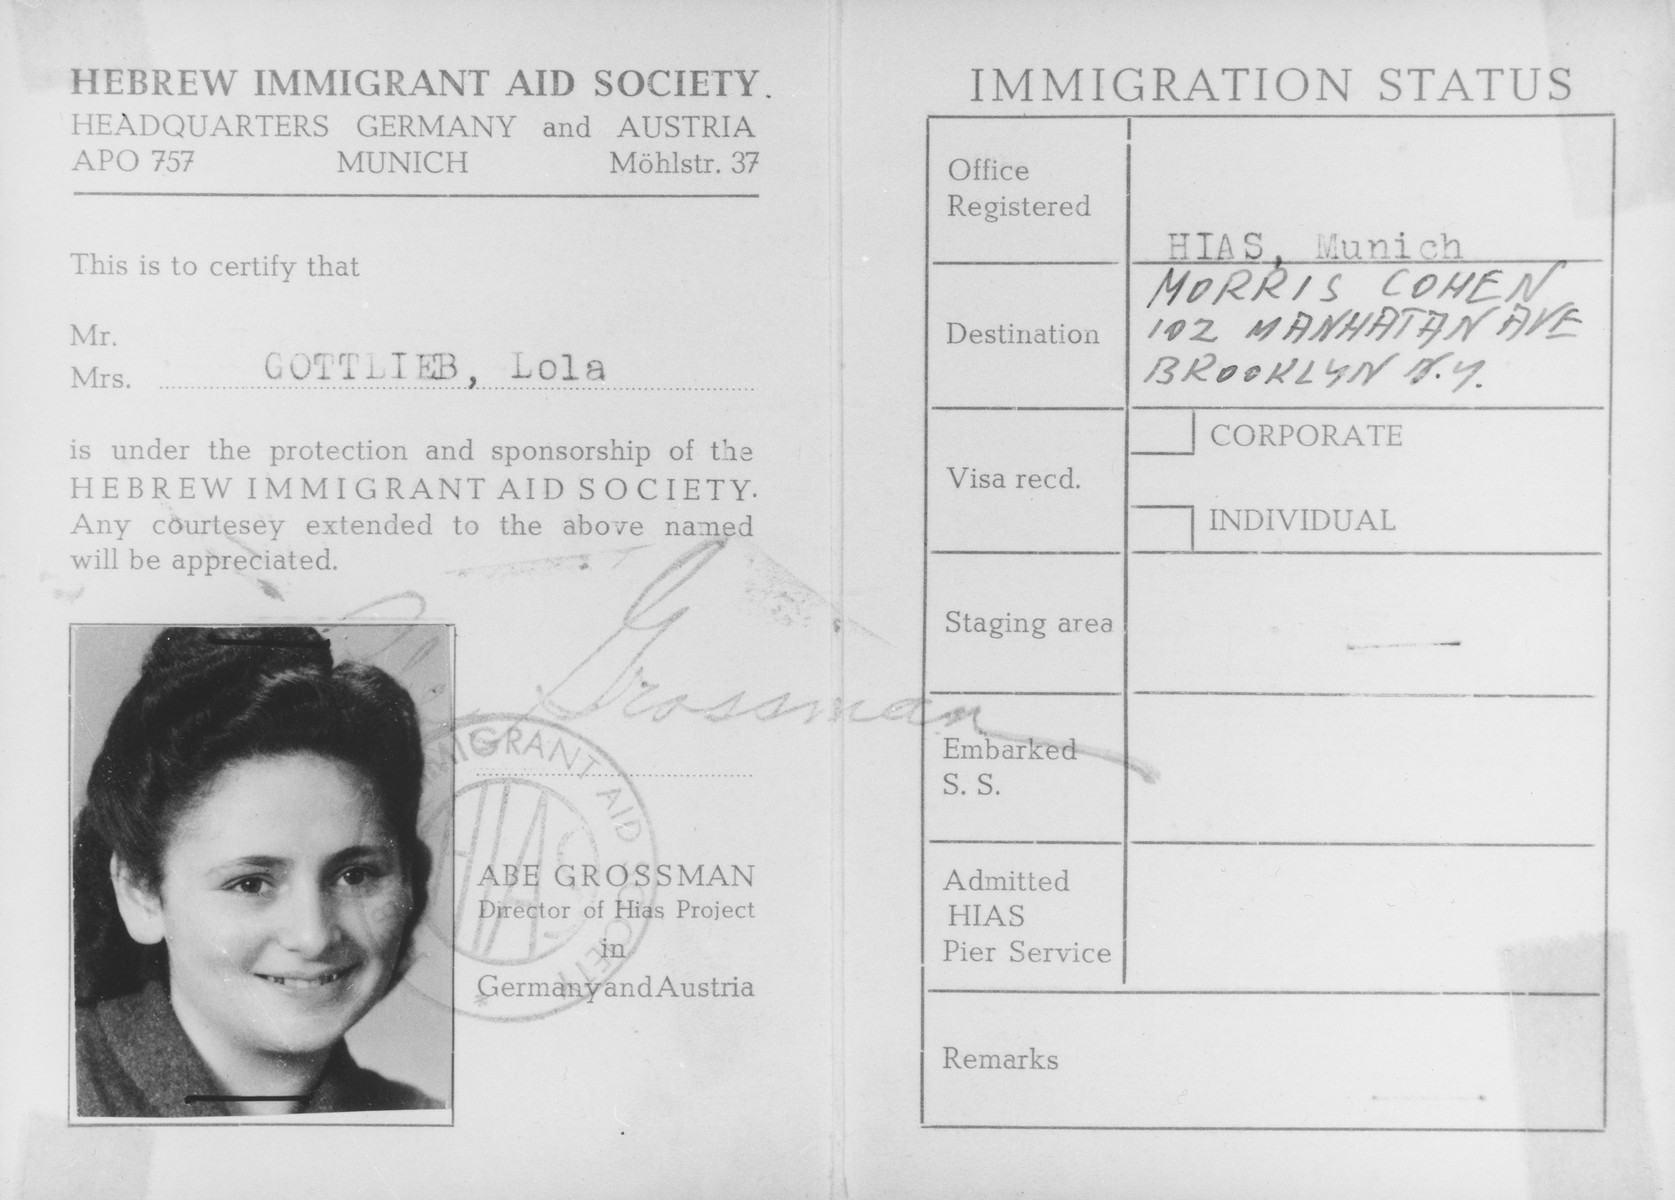 HIAS [Hebrew Immigrant Aid Society] identification card for Lola Gottlieb that was issued in Munich.